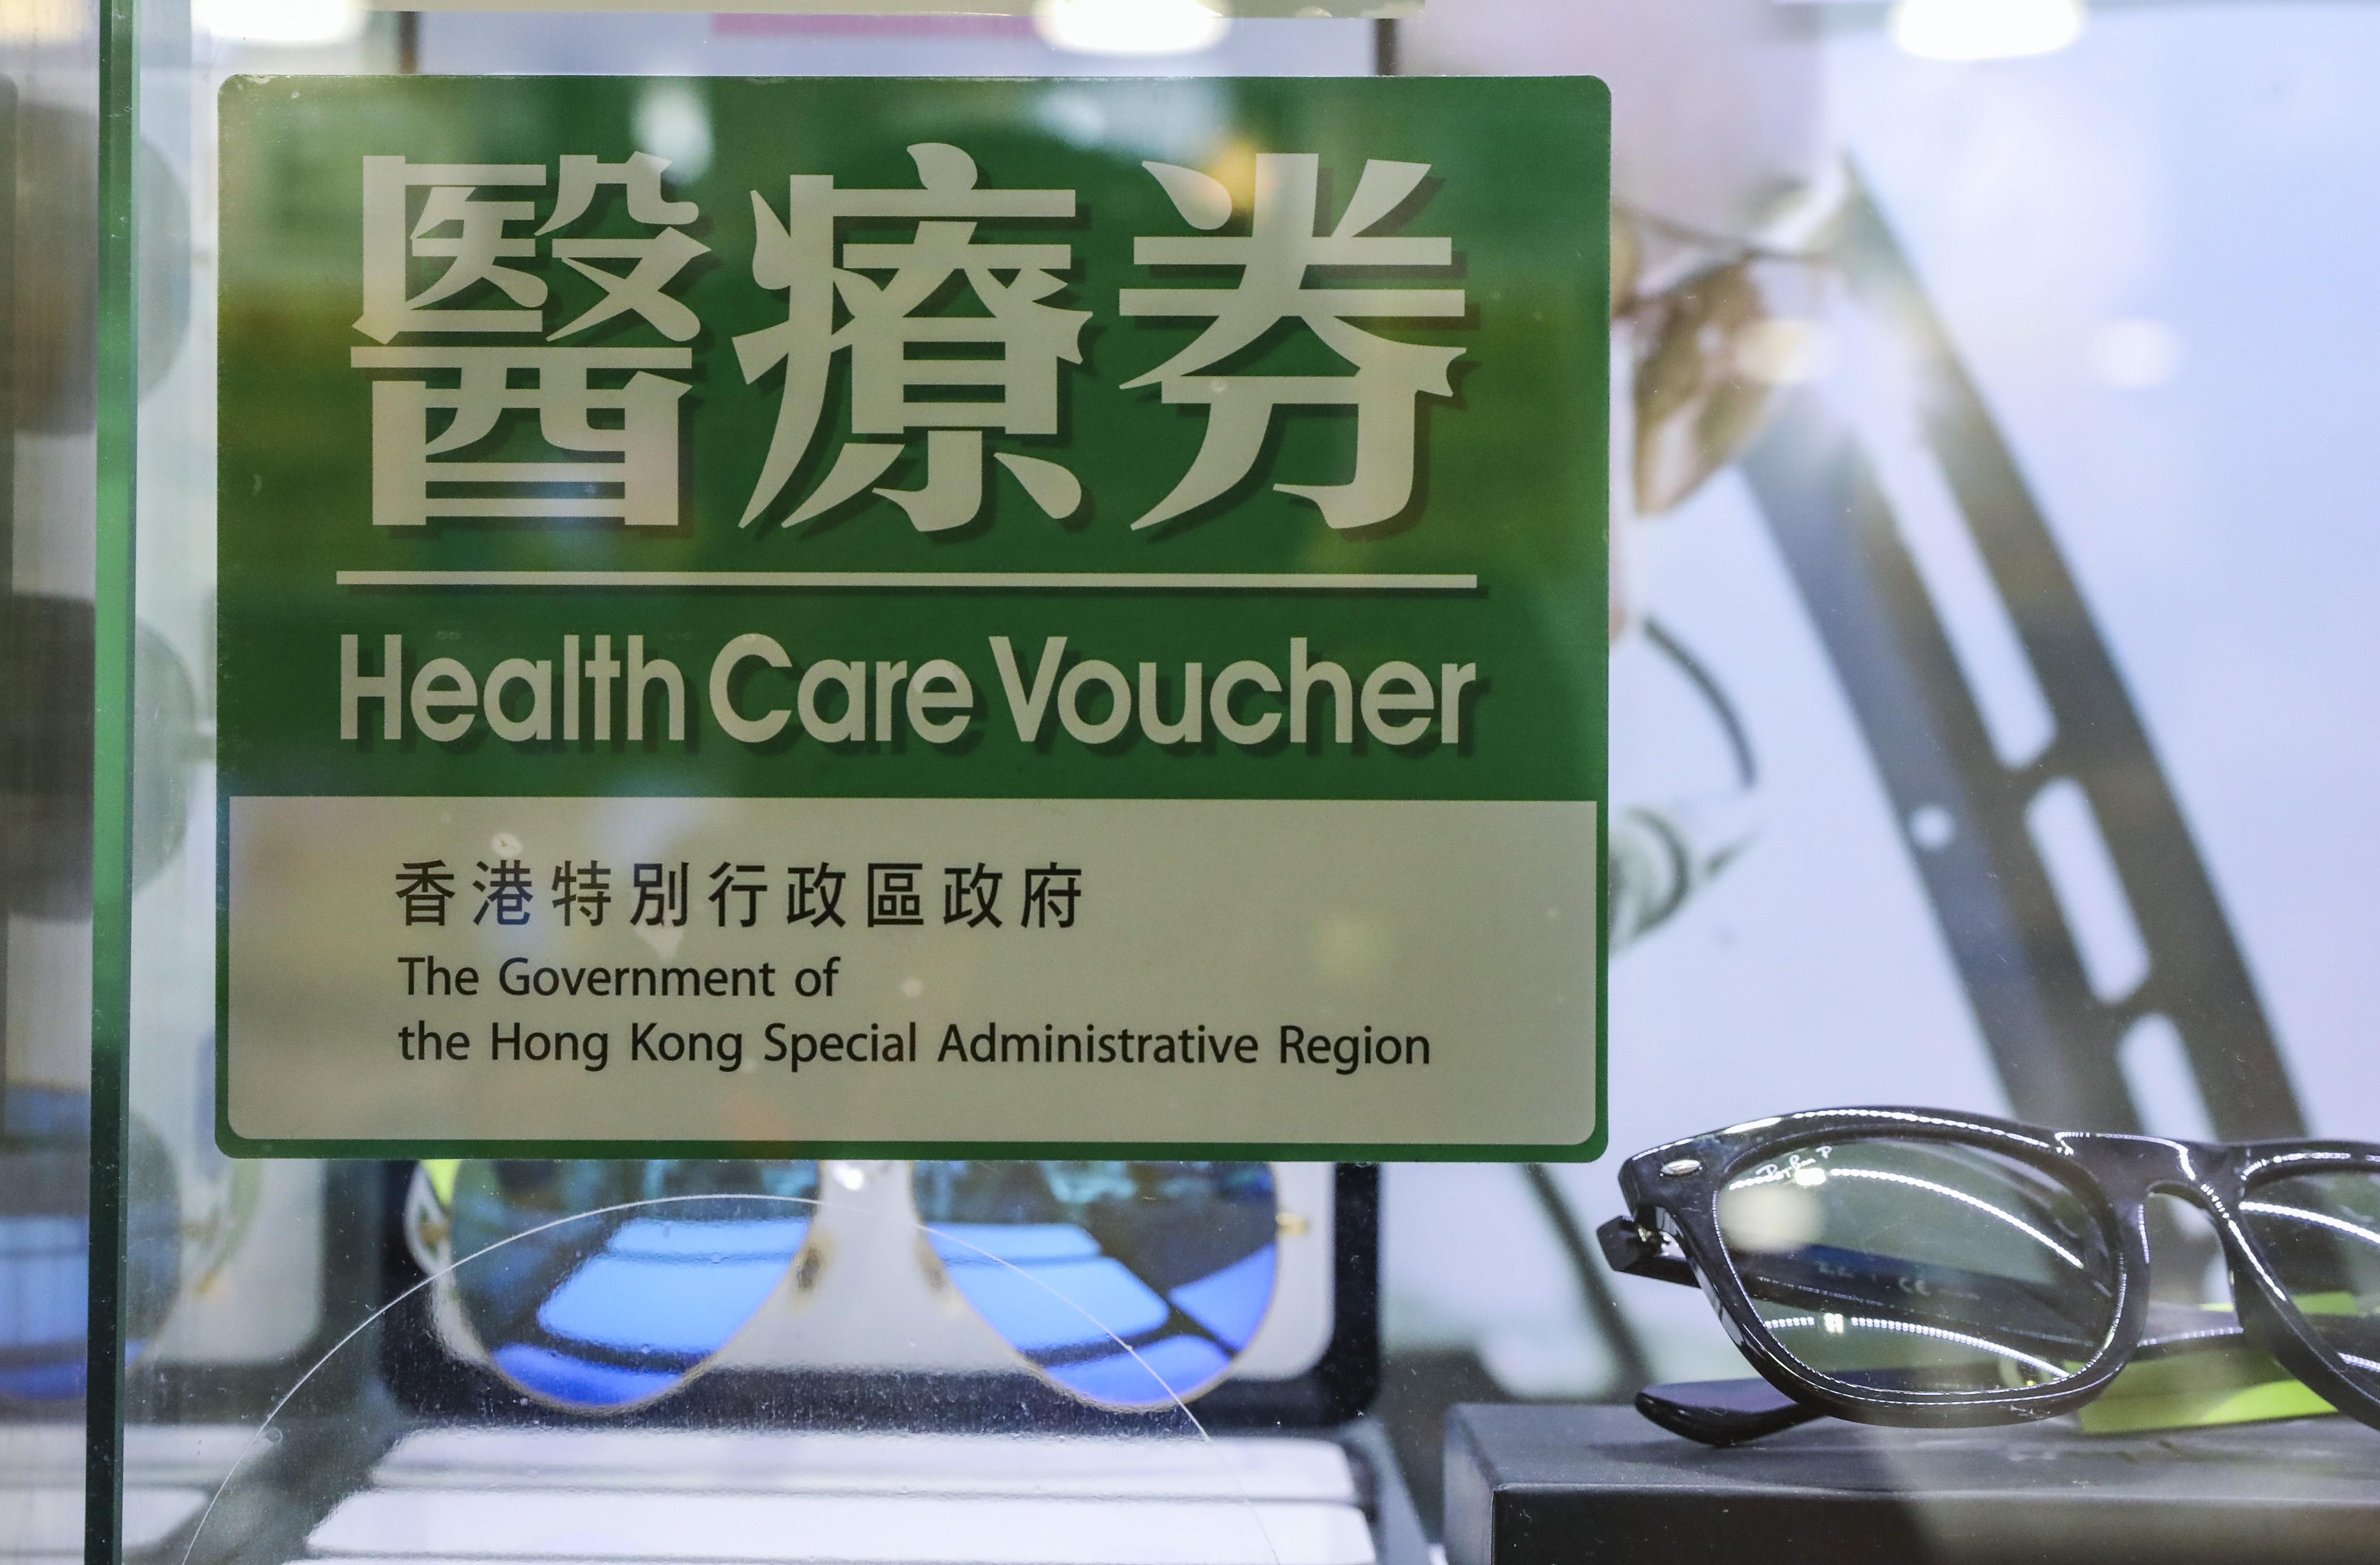 Precious Little Evidence That Vouchers >> Former Hong Kong Health Chief Slams Medical Voucher Scheme For The